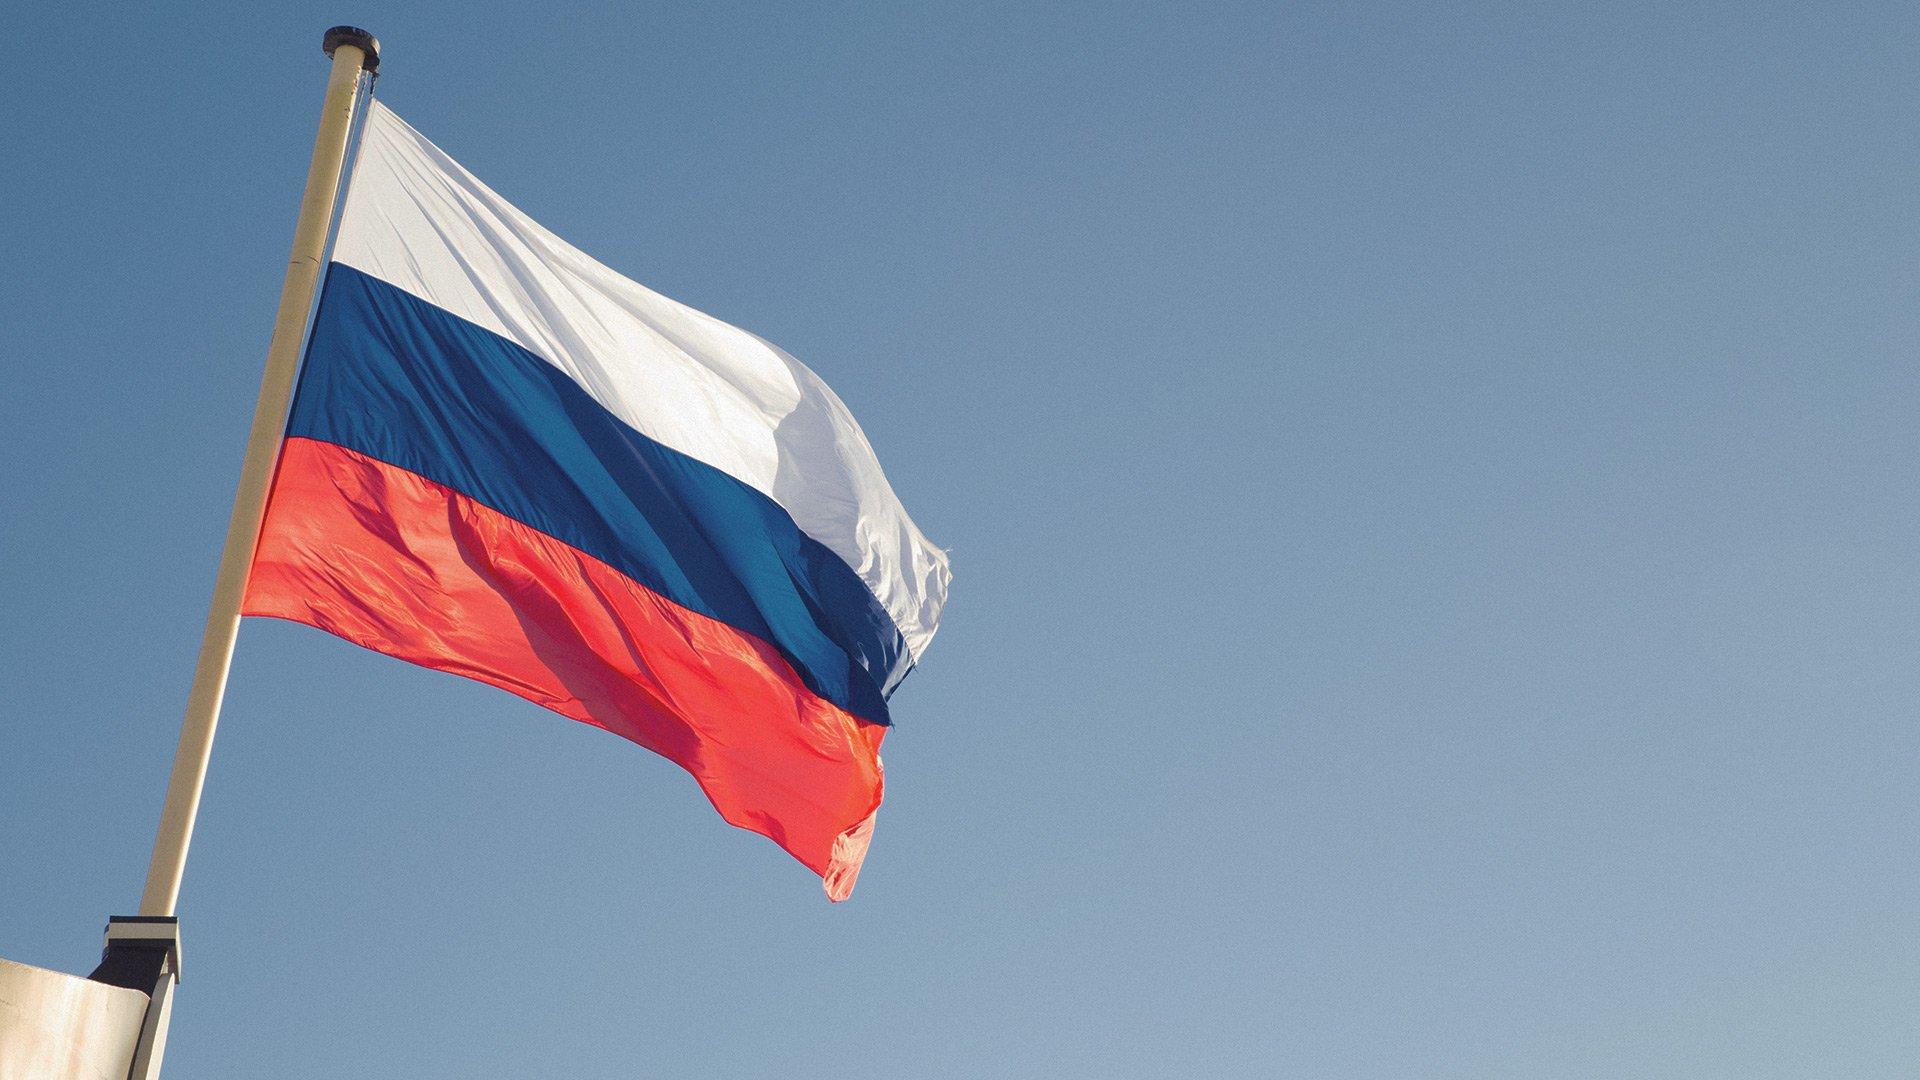 Sberbank seeks central bank approval for blockchain platform: report